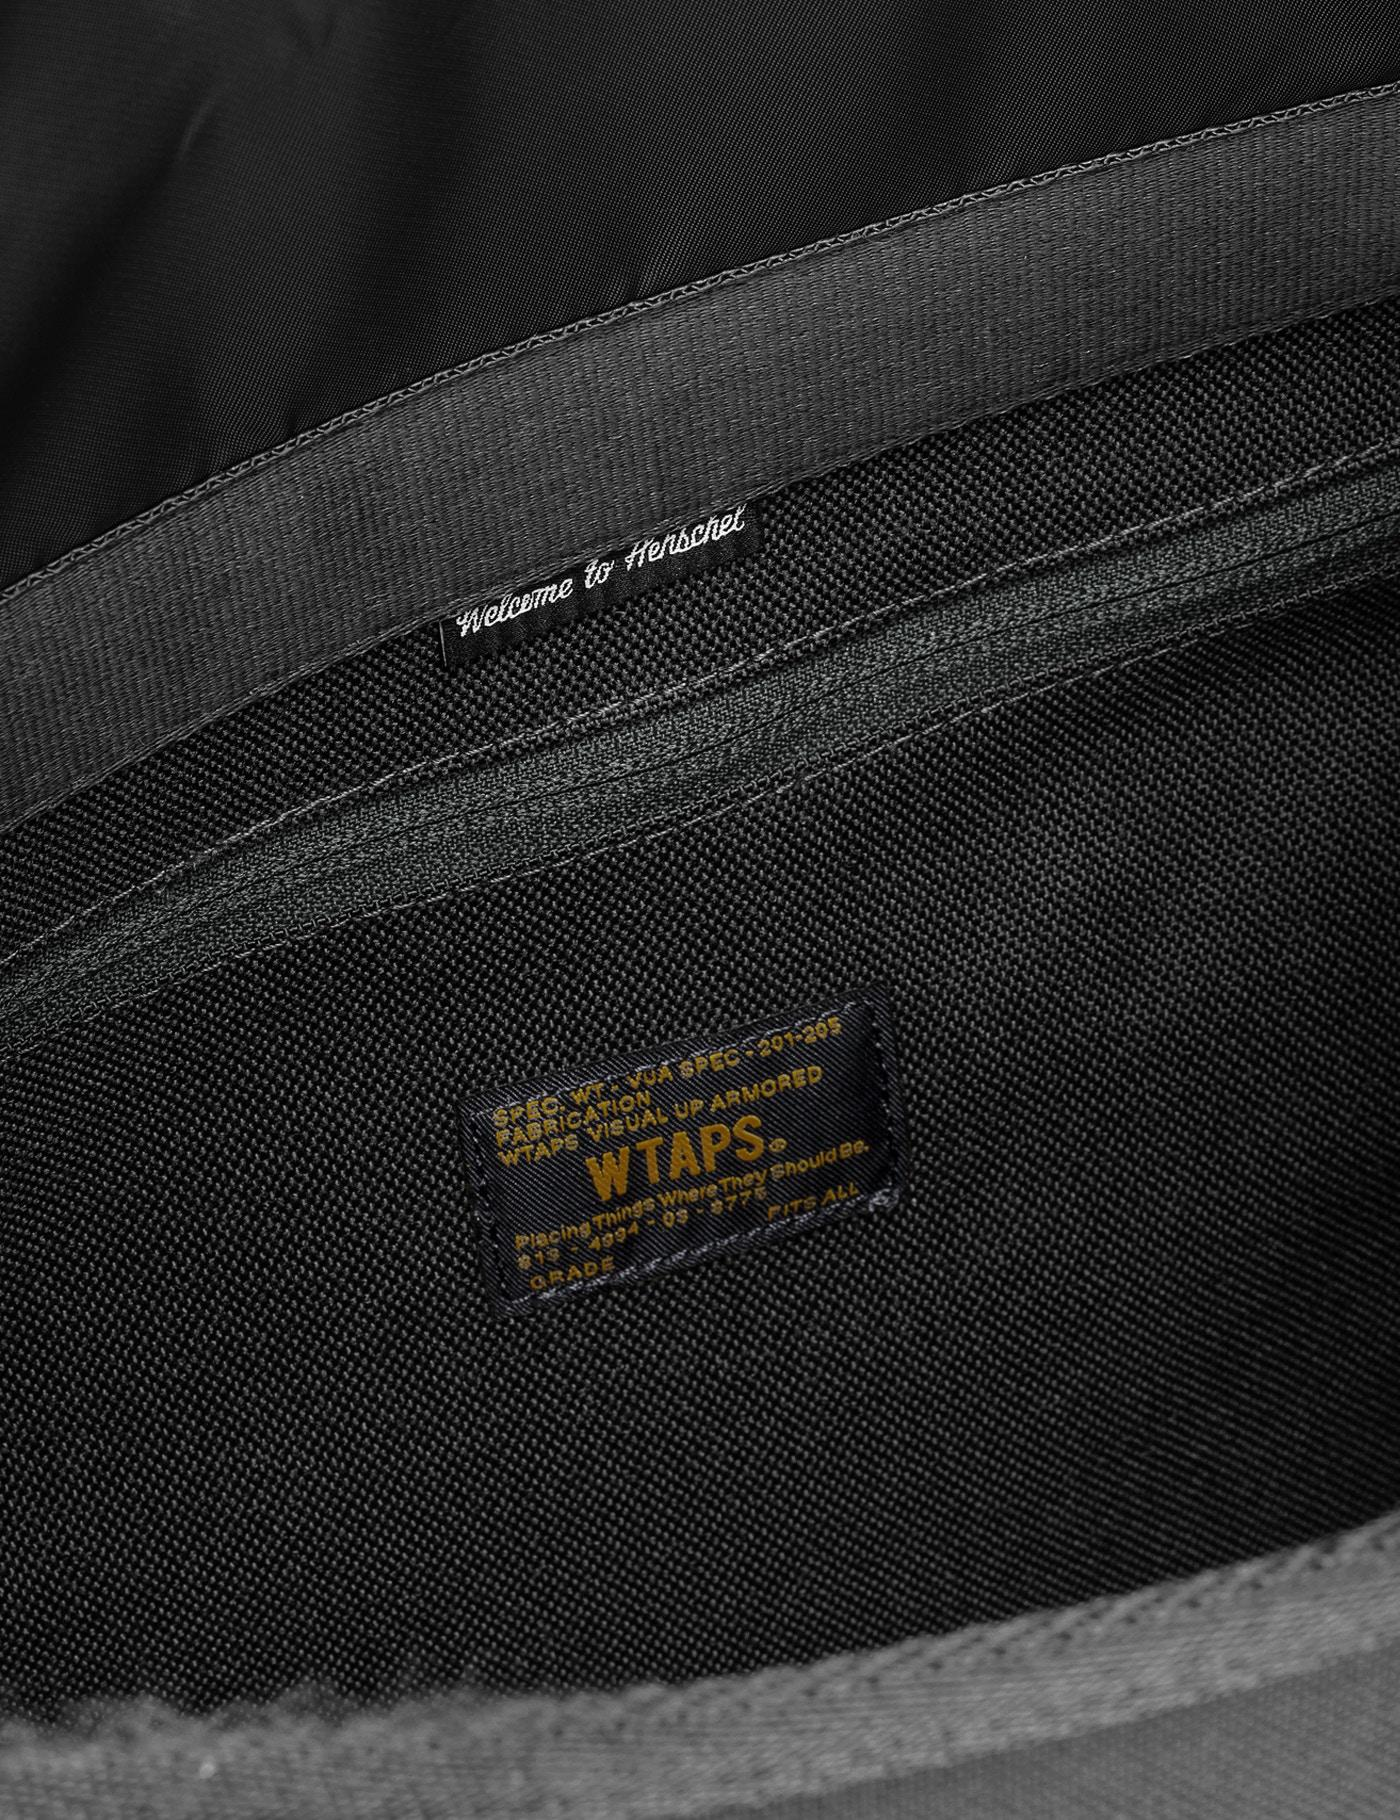 3f88ca0a61 Herschel Supply Co. Wtaps X W-380 Shoulder Bags in Black - Lyst